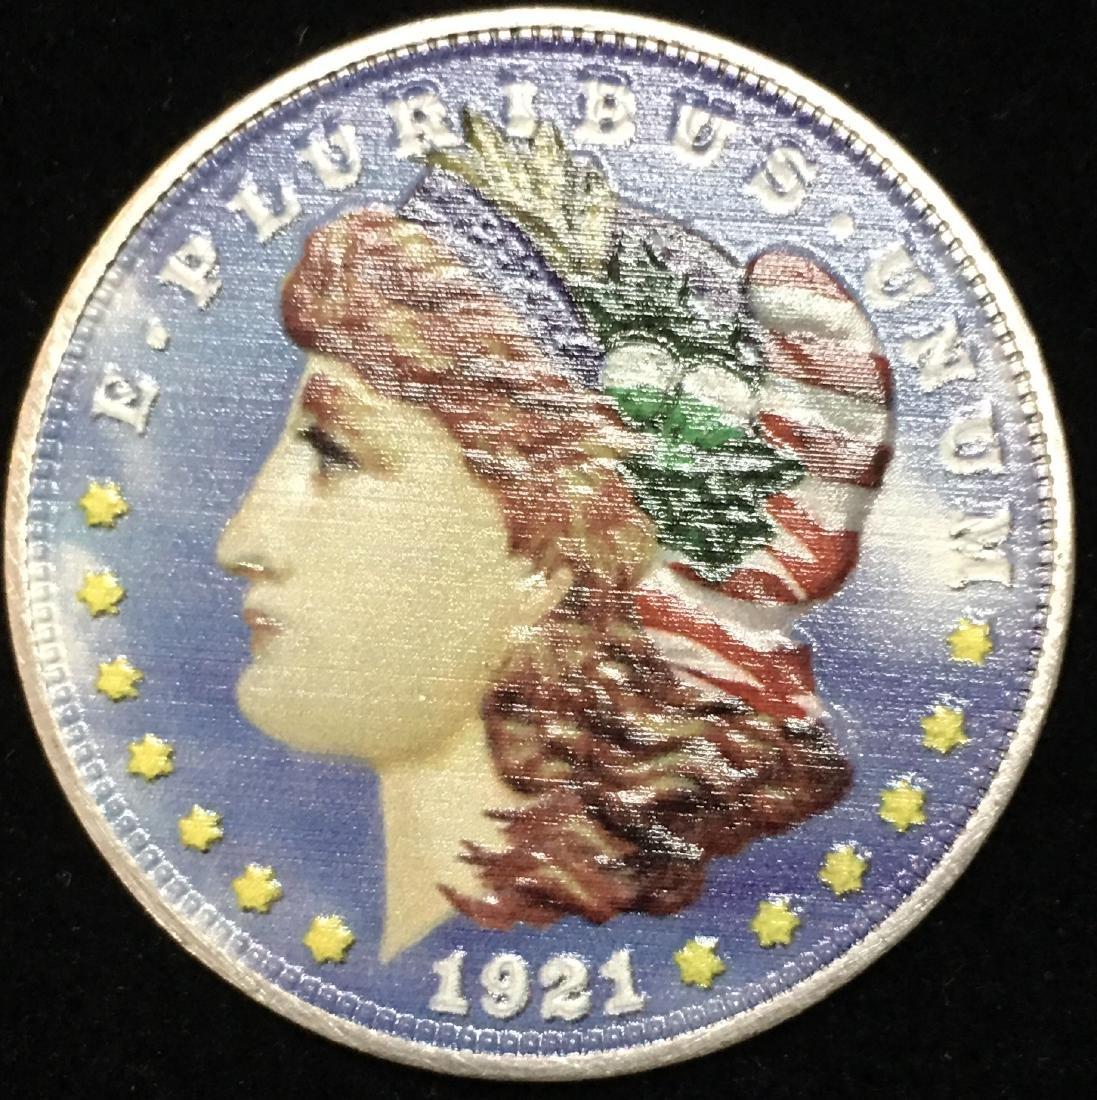 1921 $1 Colorized / Printed Morgan Silver Dollar -